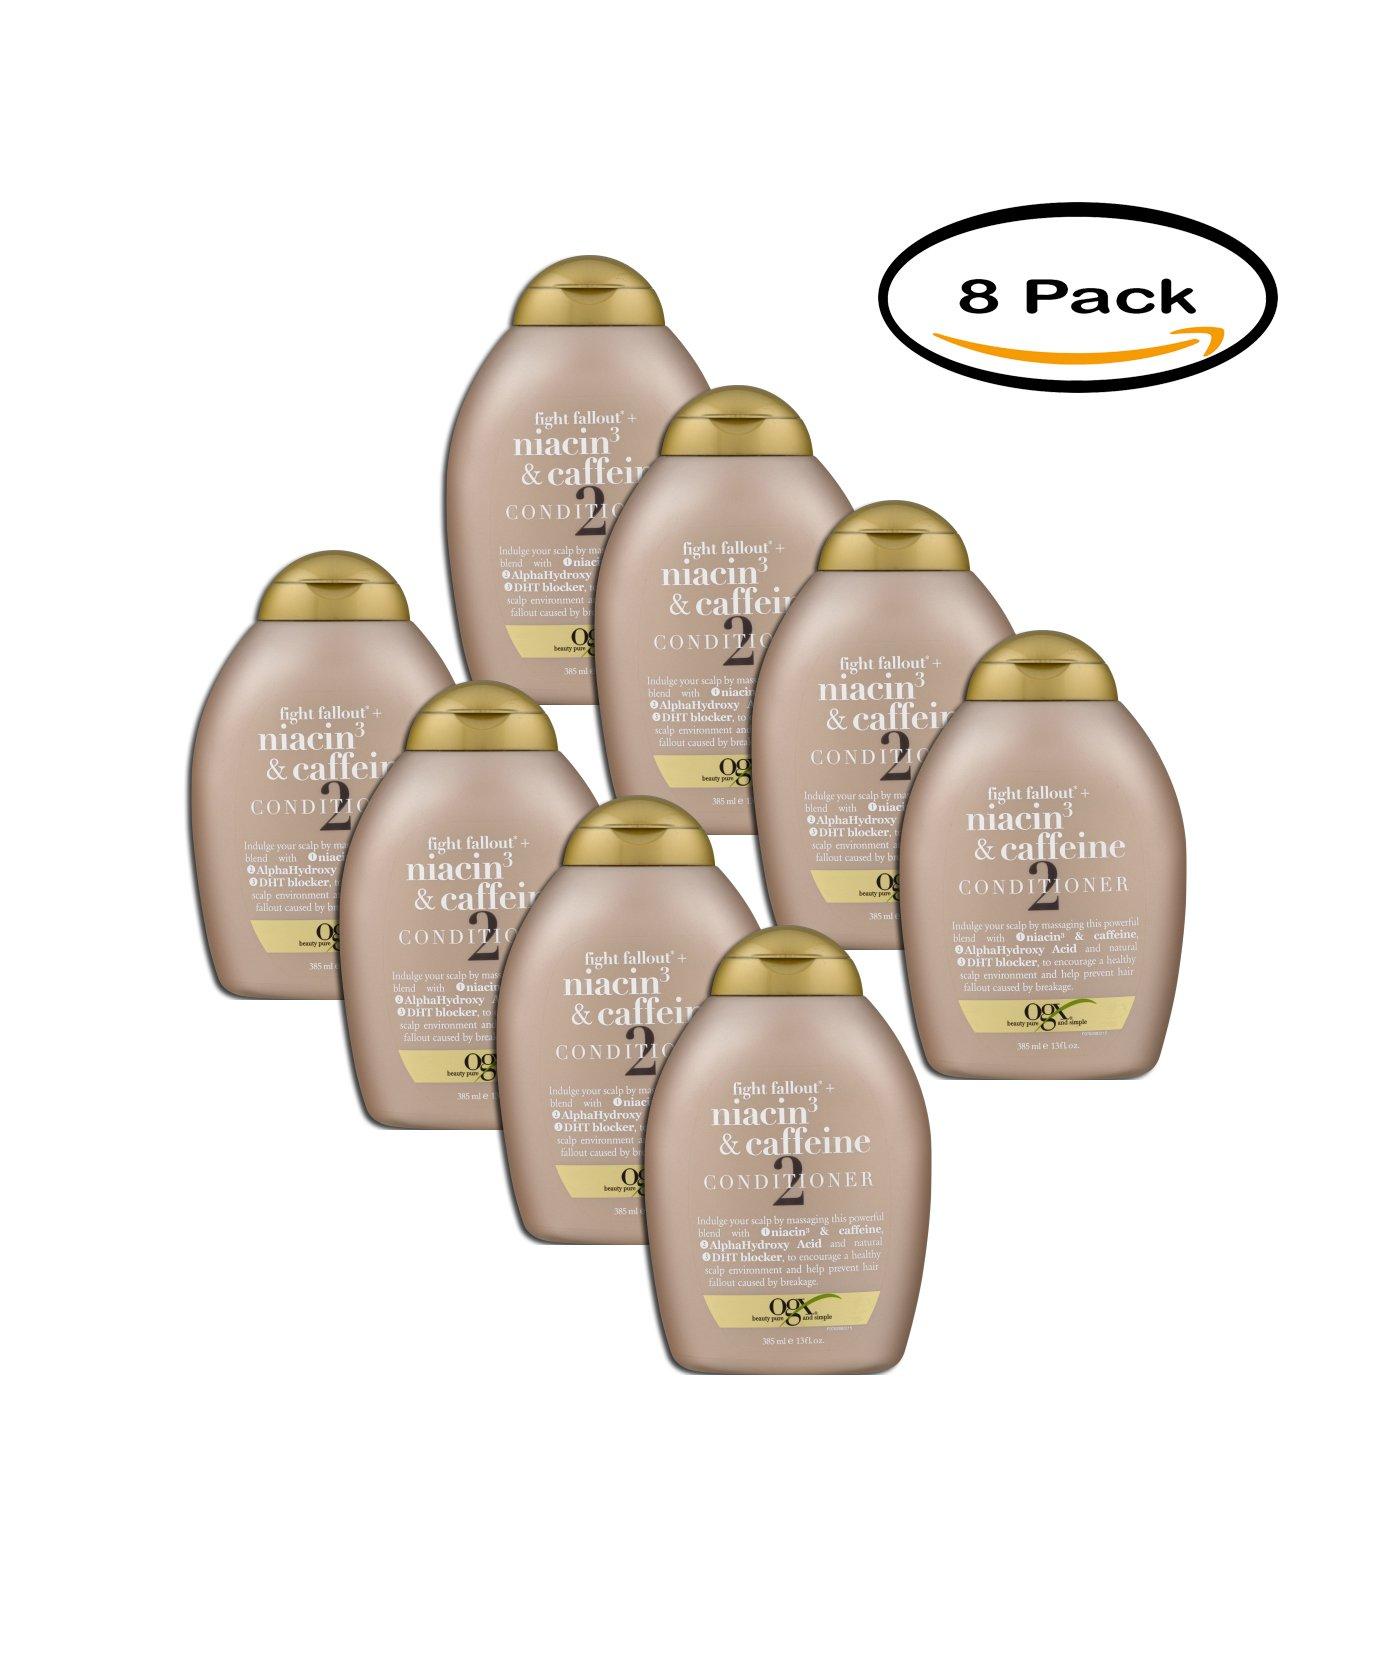 PACK OF 8 - OGX Niacin3 & Caffeine Conditioner, 13.0 FL OZ by OGX